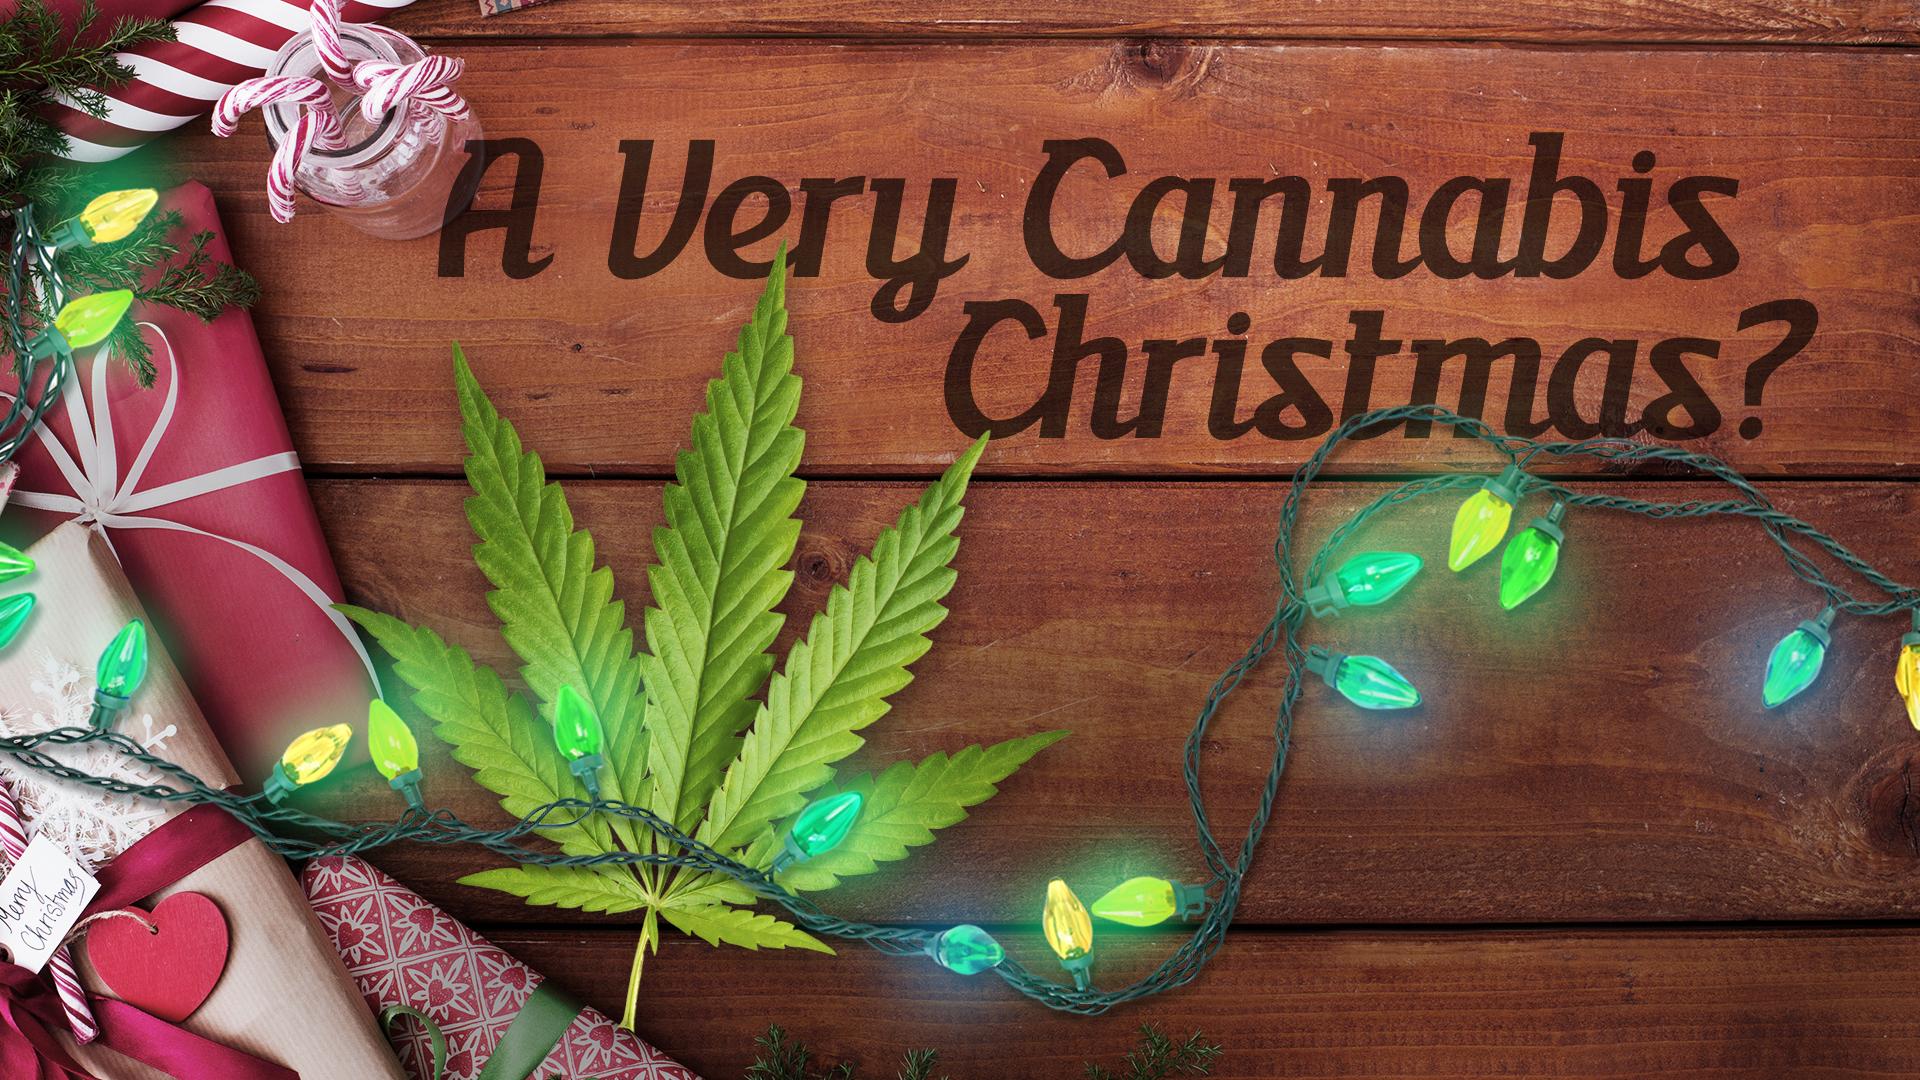 20920453_FM_MONITOR_PLASMA_A _Very_Cannabis_Christmas.png